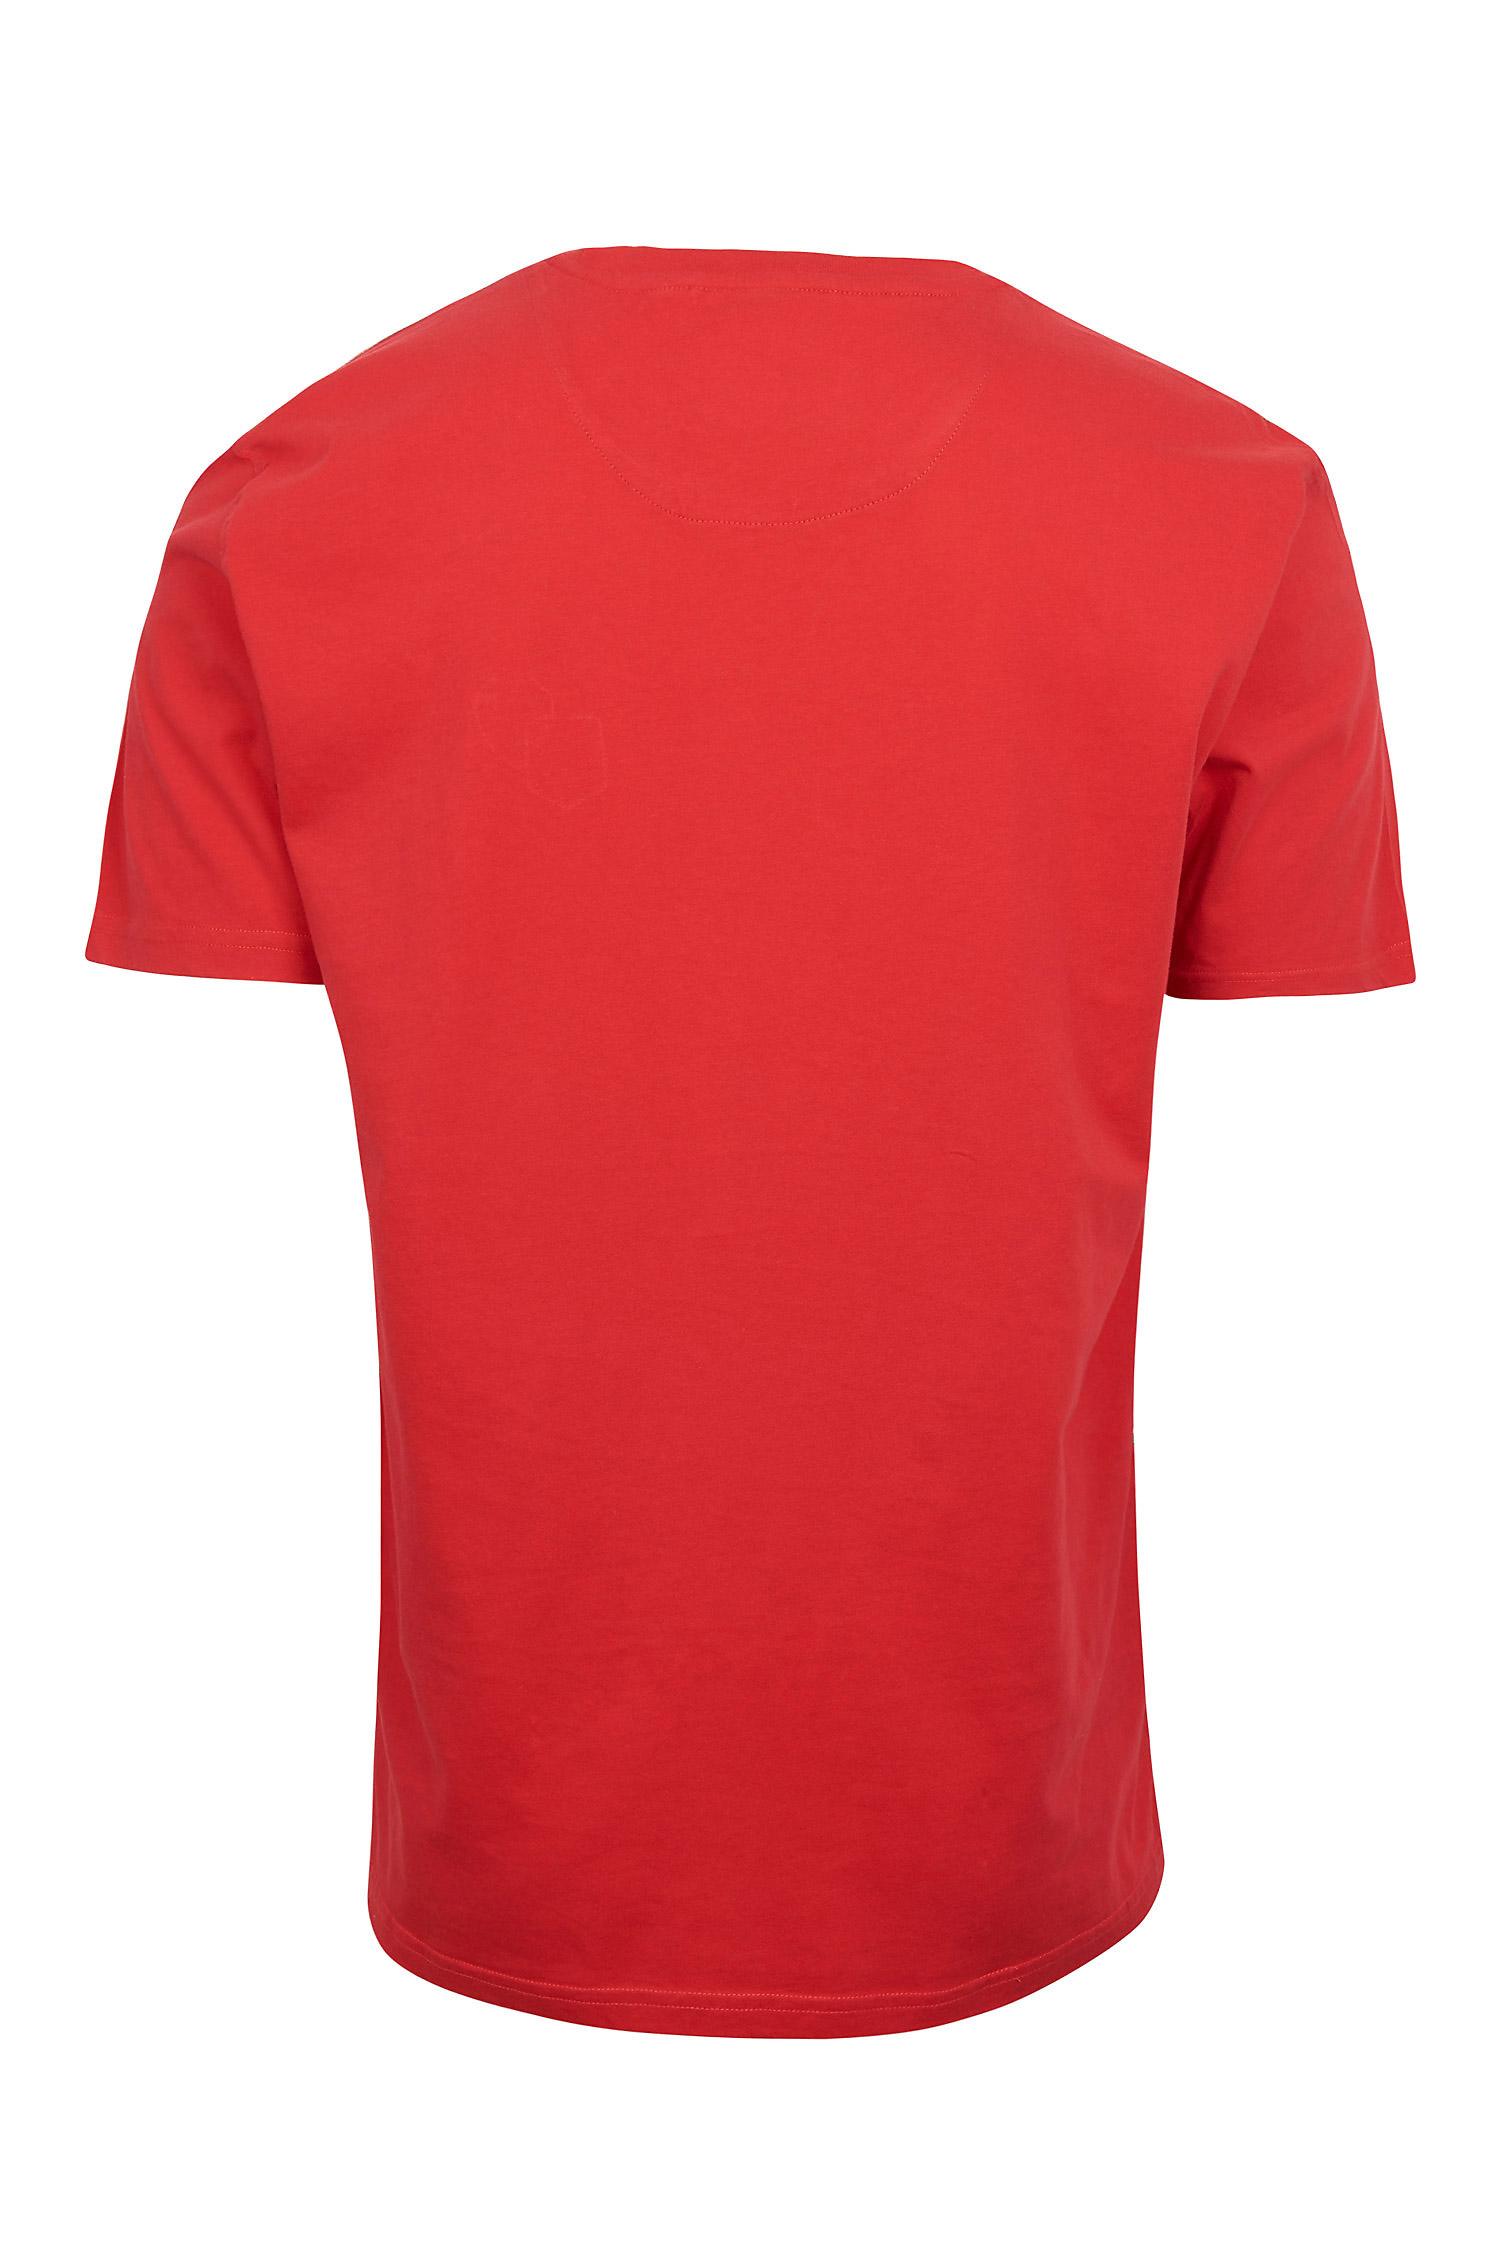 Sport, Camisetas M. Corta, 109107, ROJO | Zoom